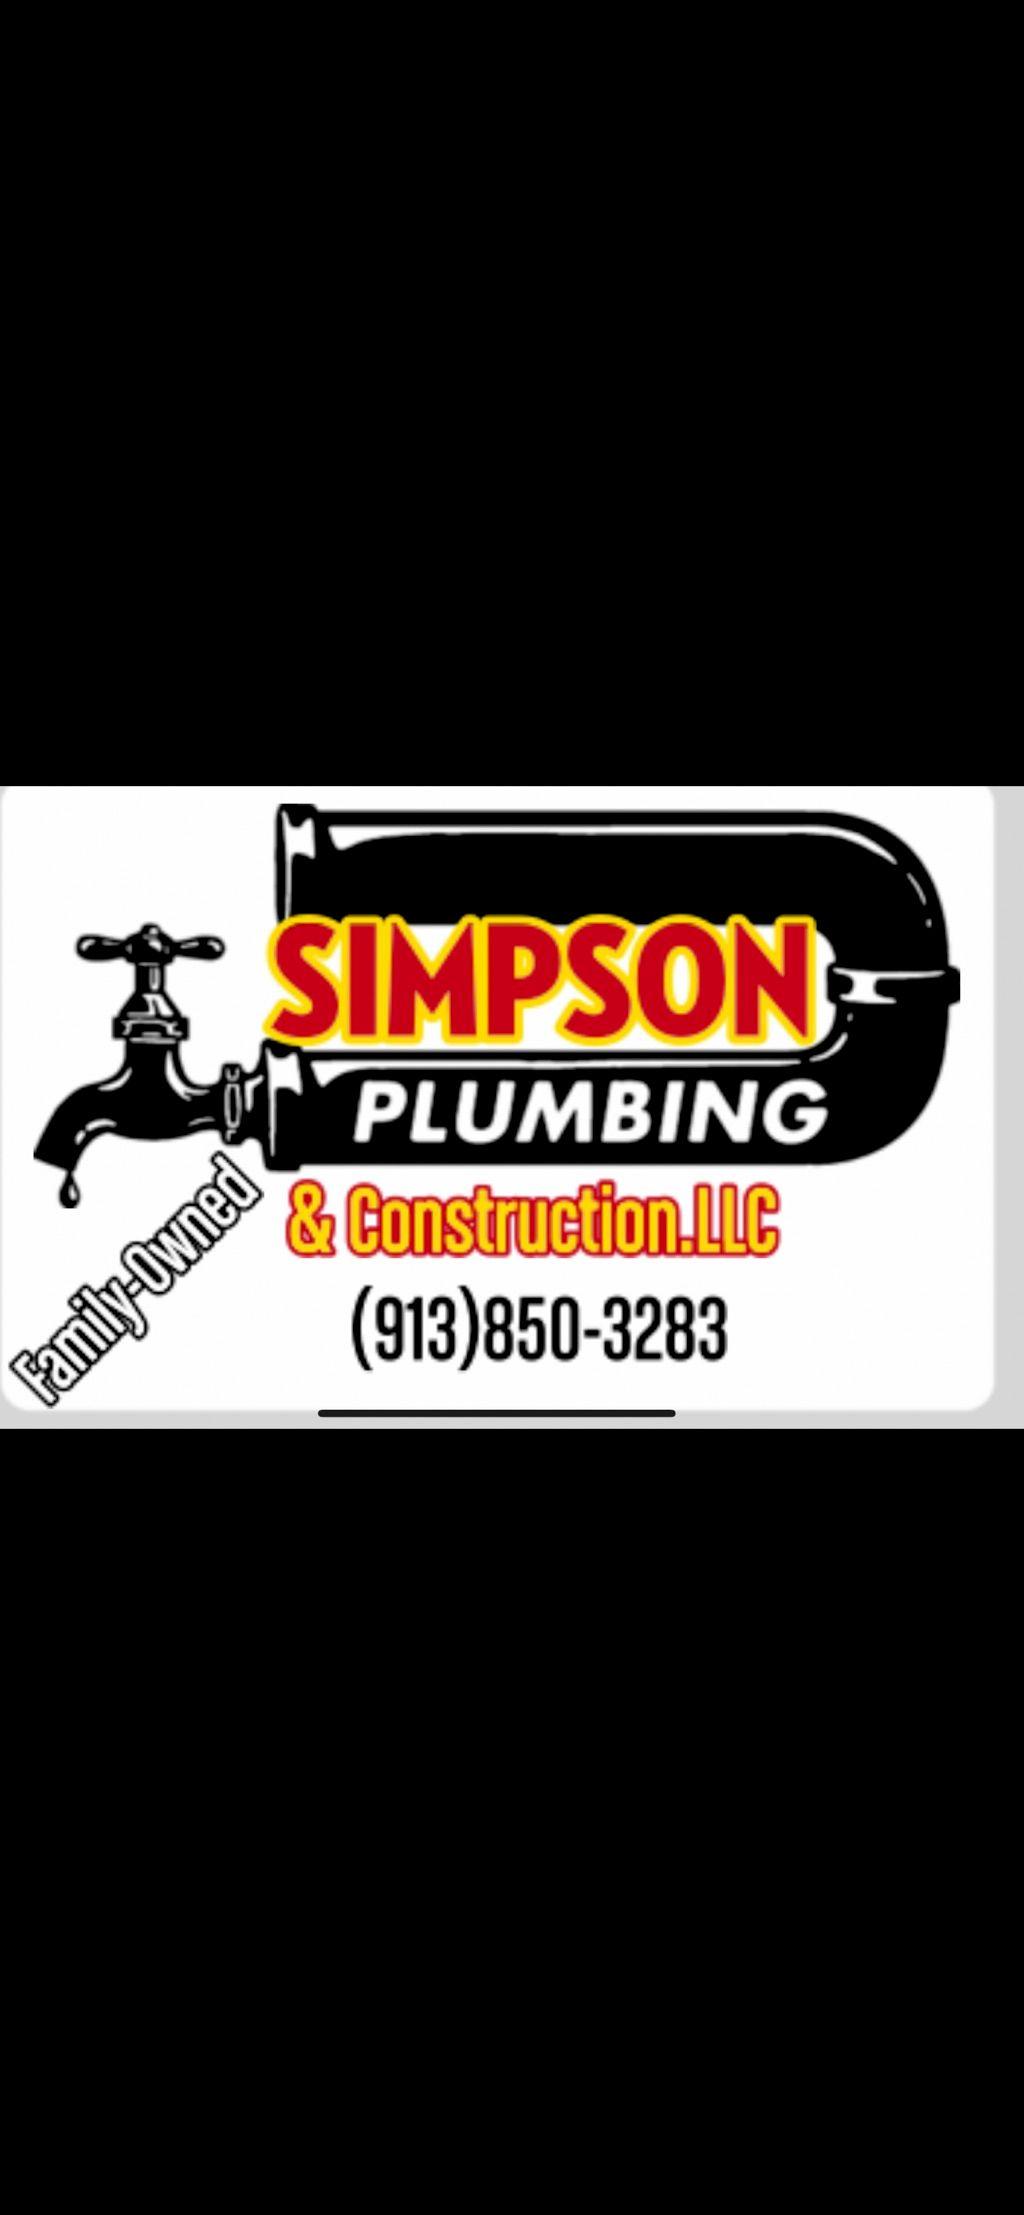 Simpson Plumbing & construction.LLC